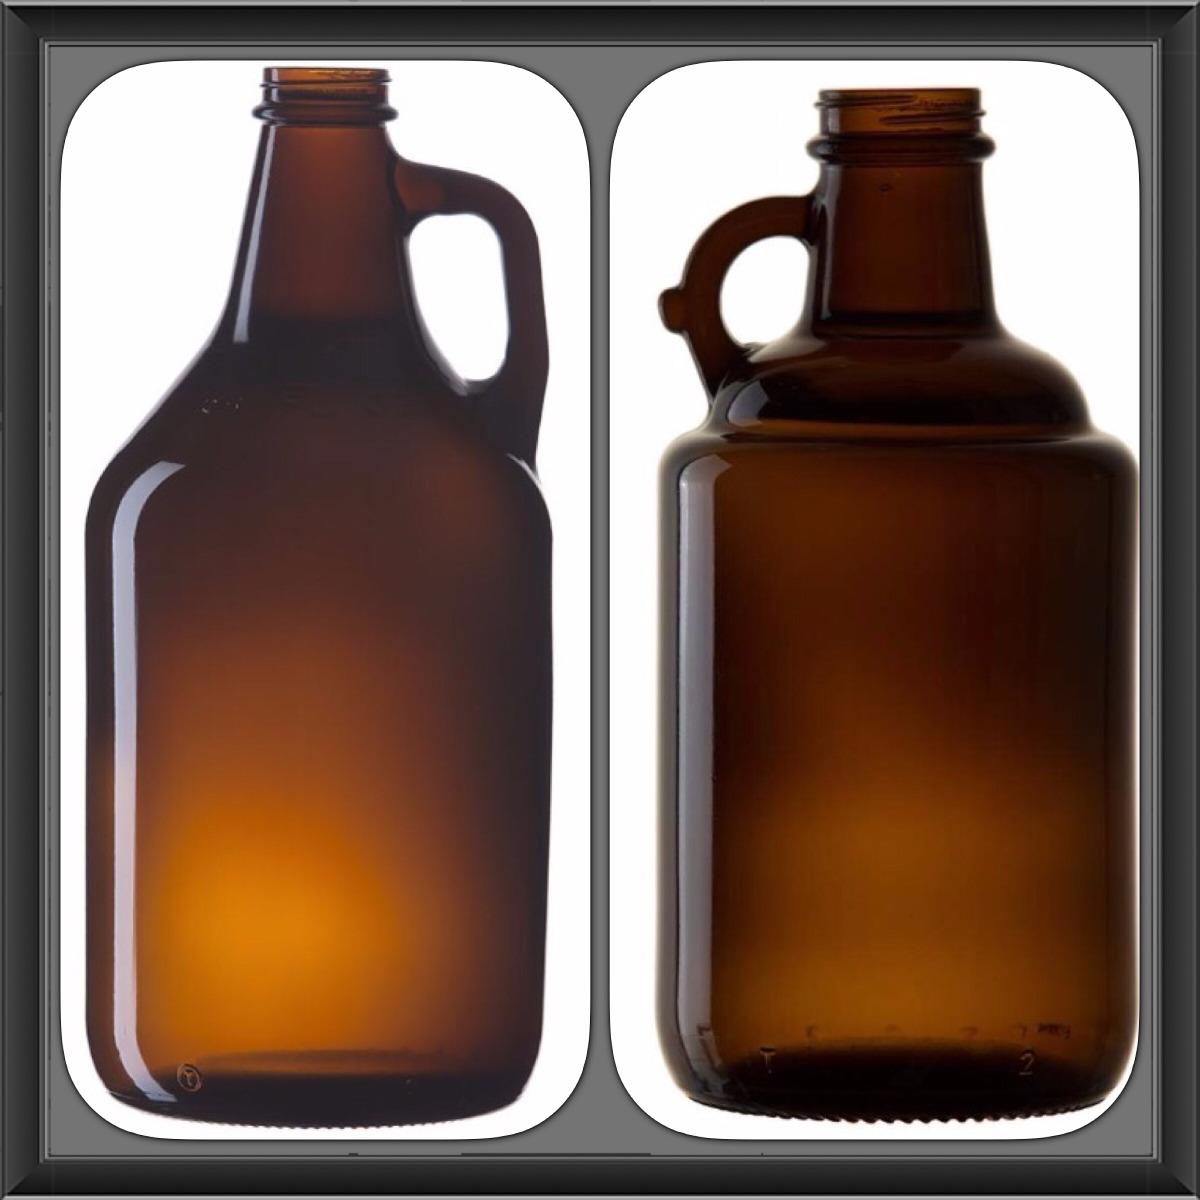 Growler Botell N Cerveza 1 Y 2 Lts Importados 90 00 En  # Muebles Nadir Avellaneda